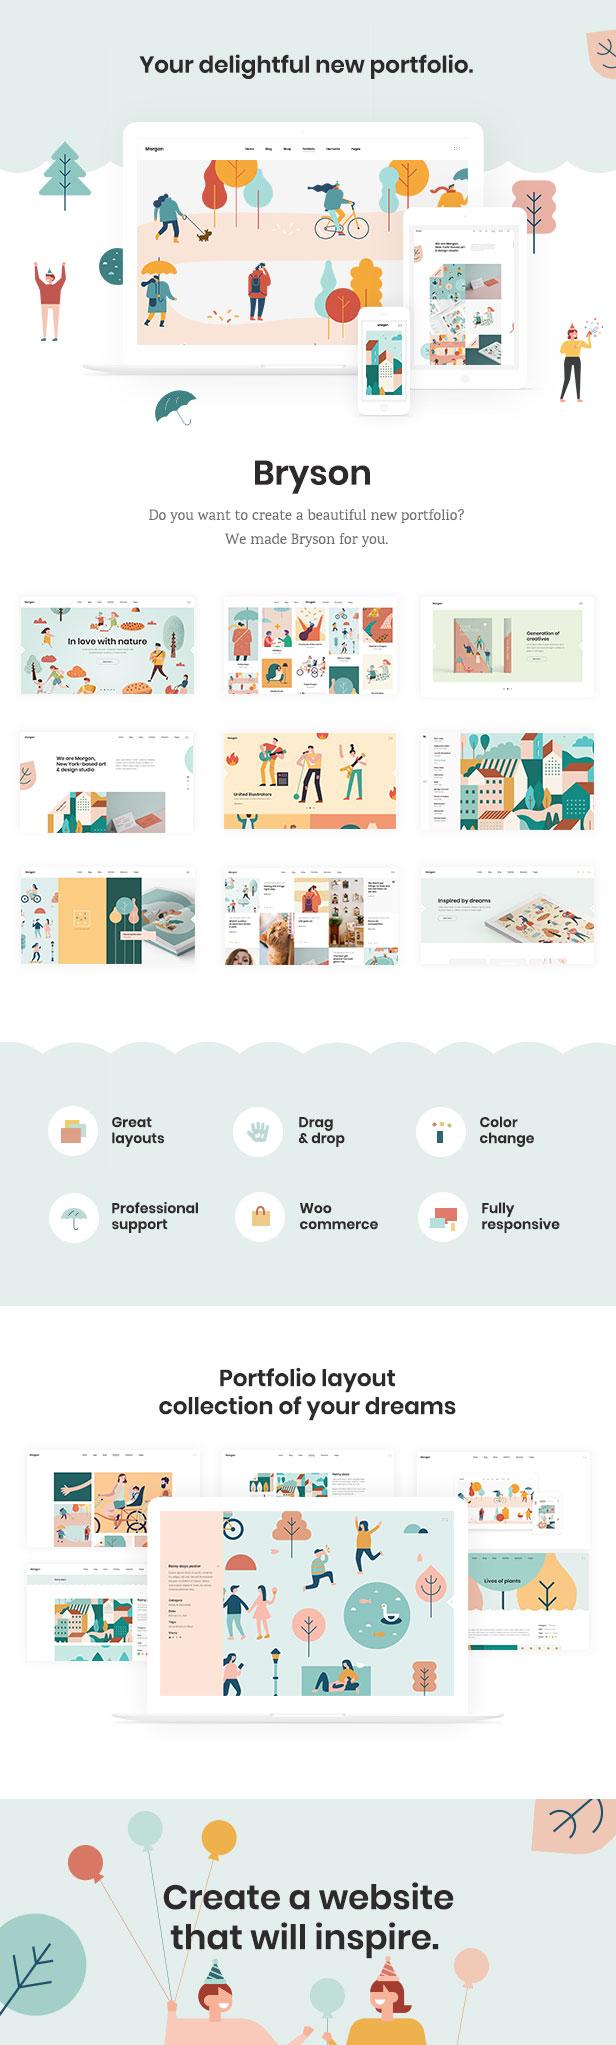 Bryson - Illustration and Design Portfolio Theme - 1